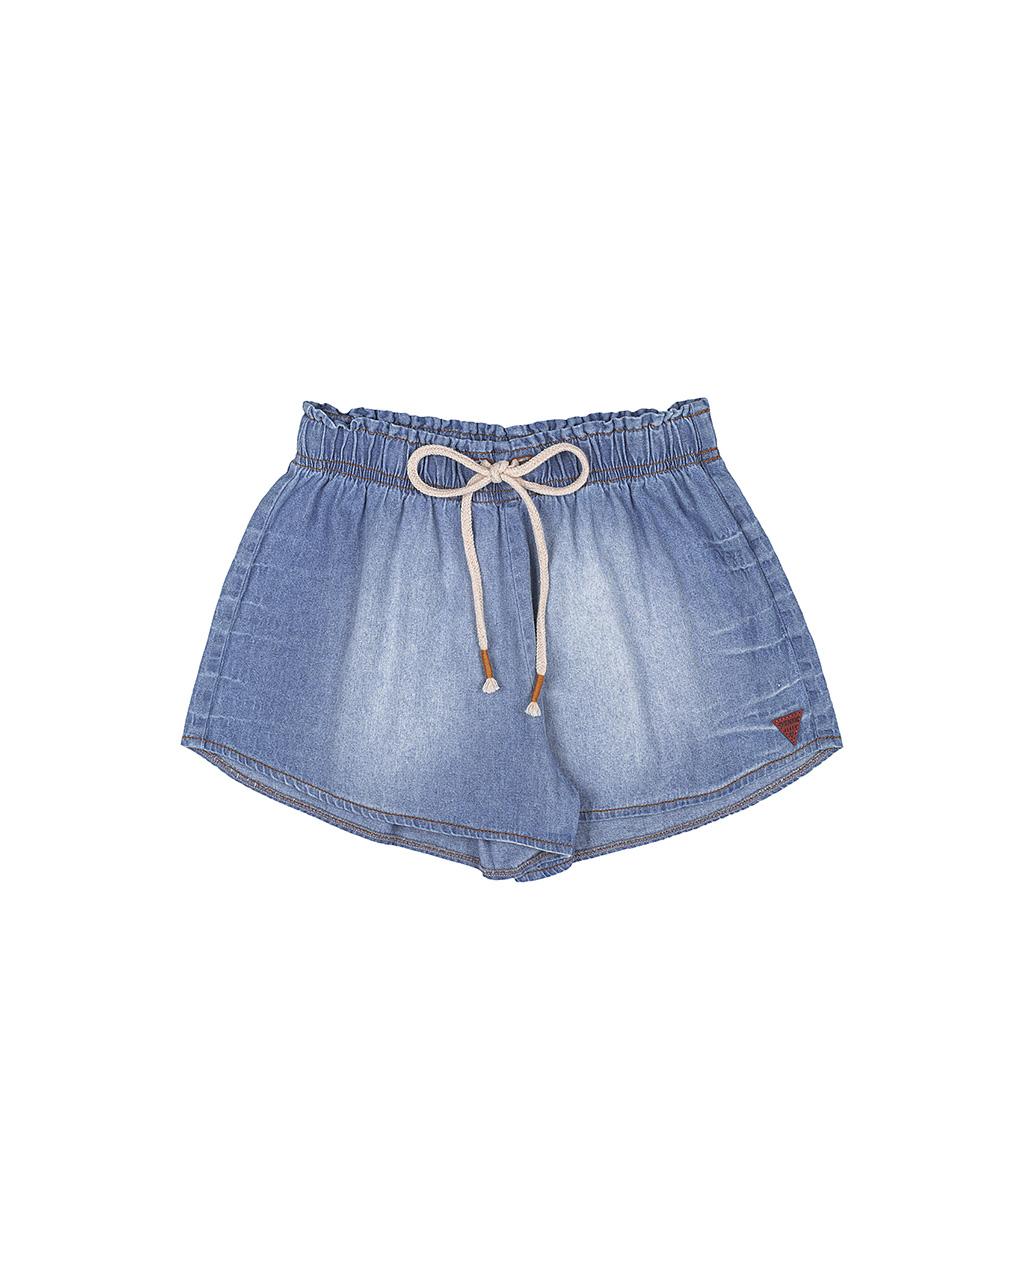 Shorts Teen Jeans Molinho Cos Elastico I Am